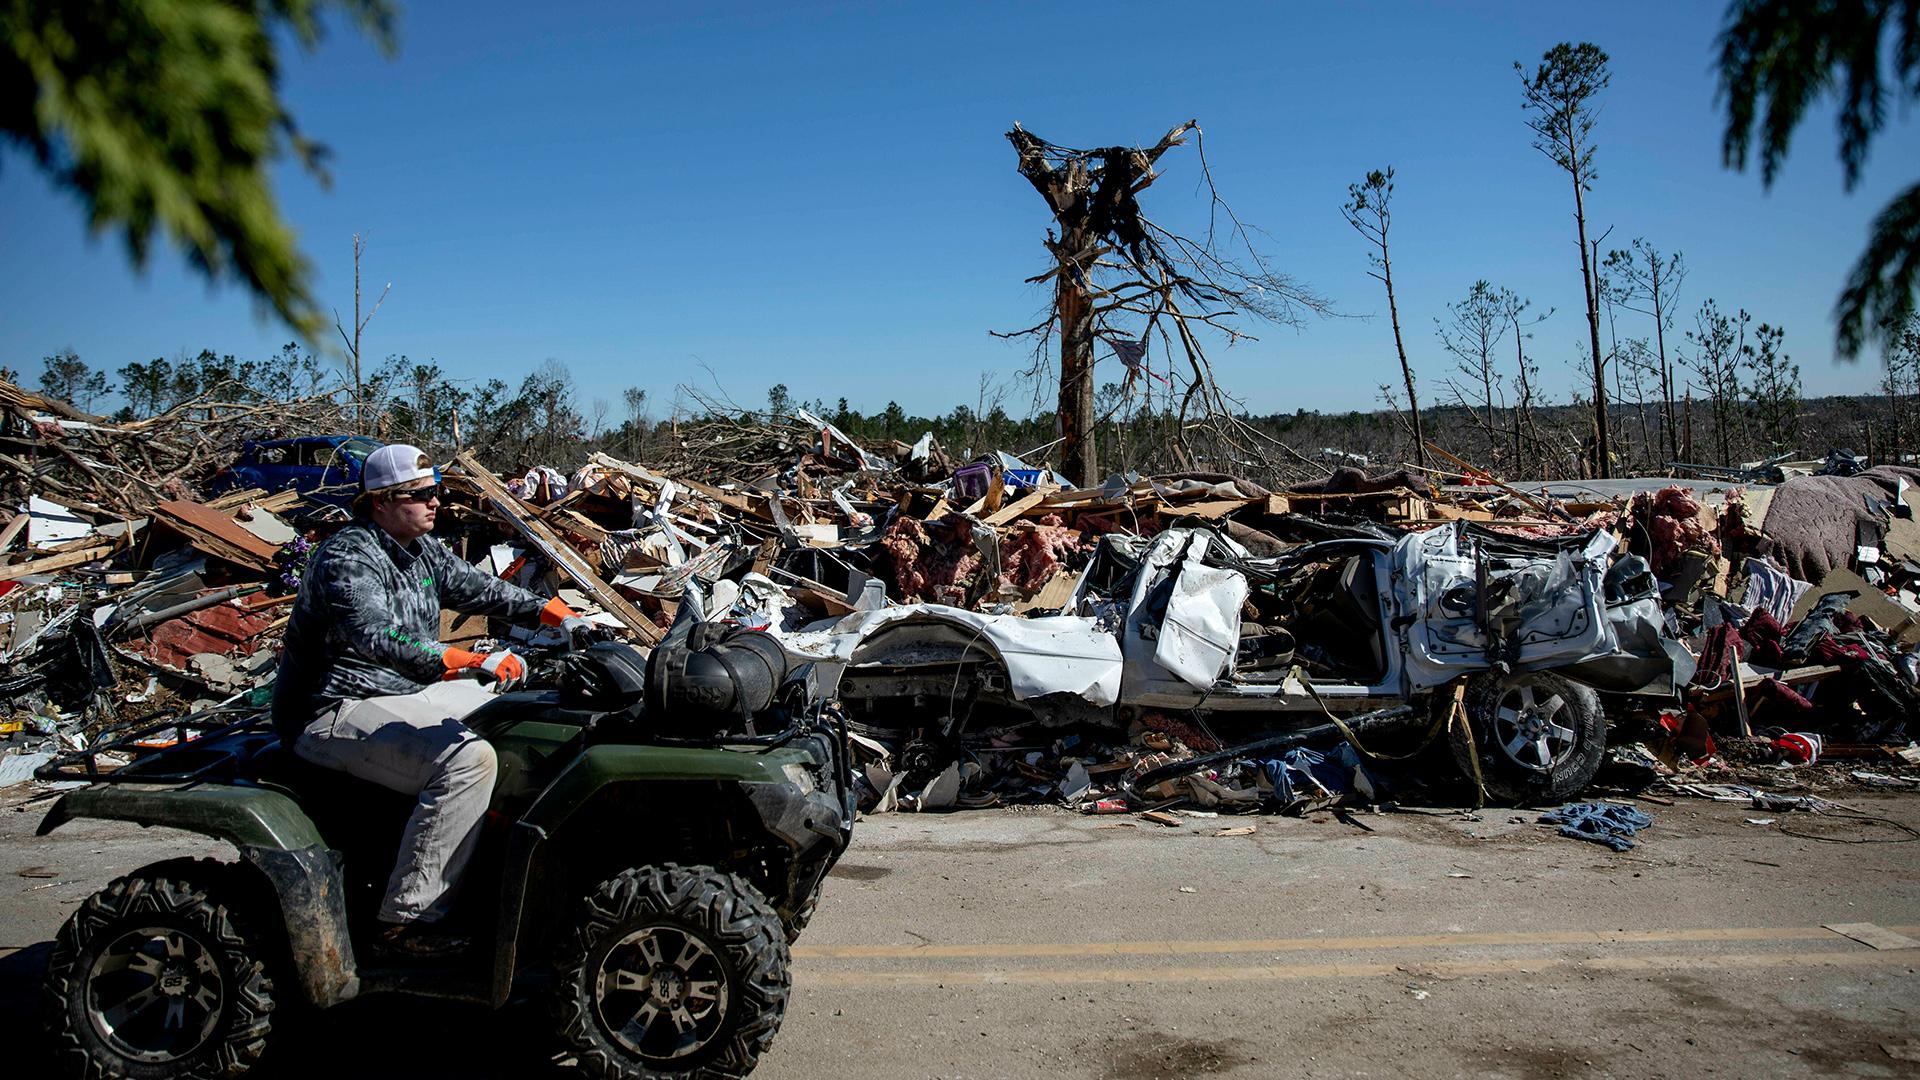 alabama tornado ap images_1551807052763.jpg-873772846.jpg